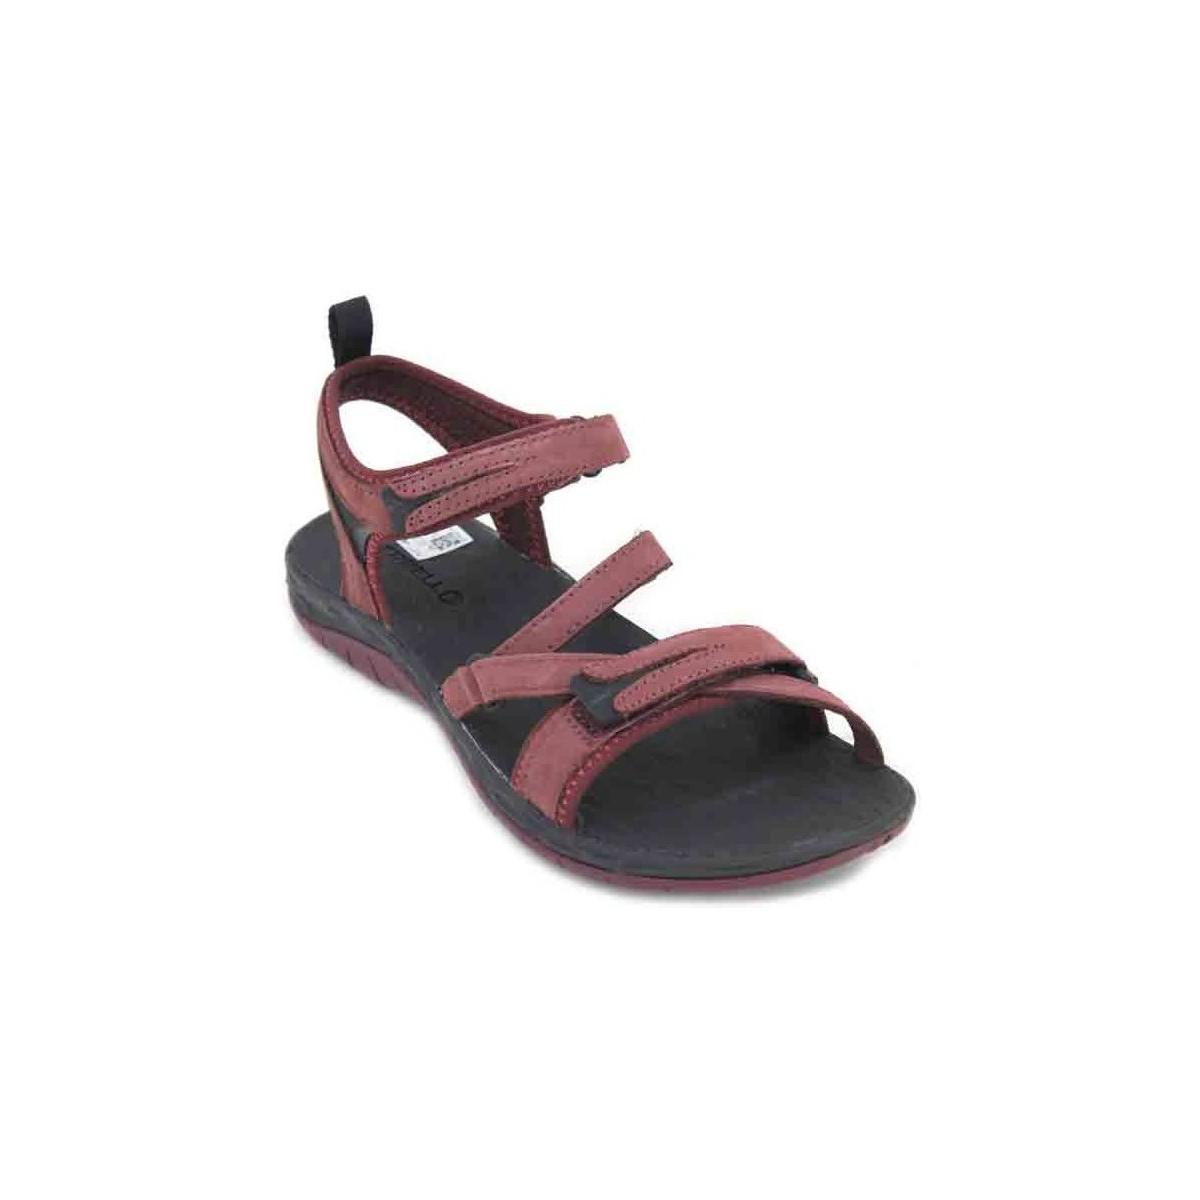 7387e4a17a61 Merrell Siren Strap Q2 Women s Sandals Women s Sandals In Brown in ...